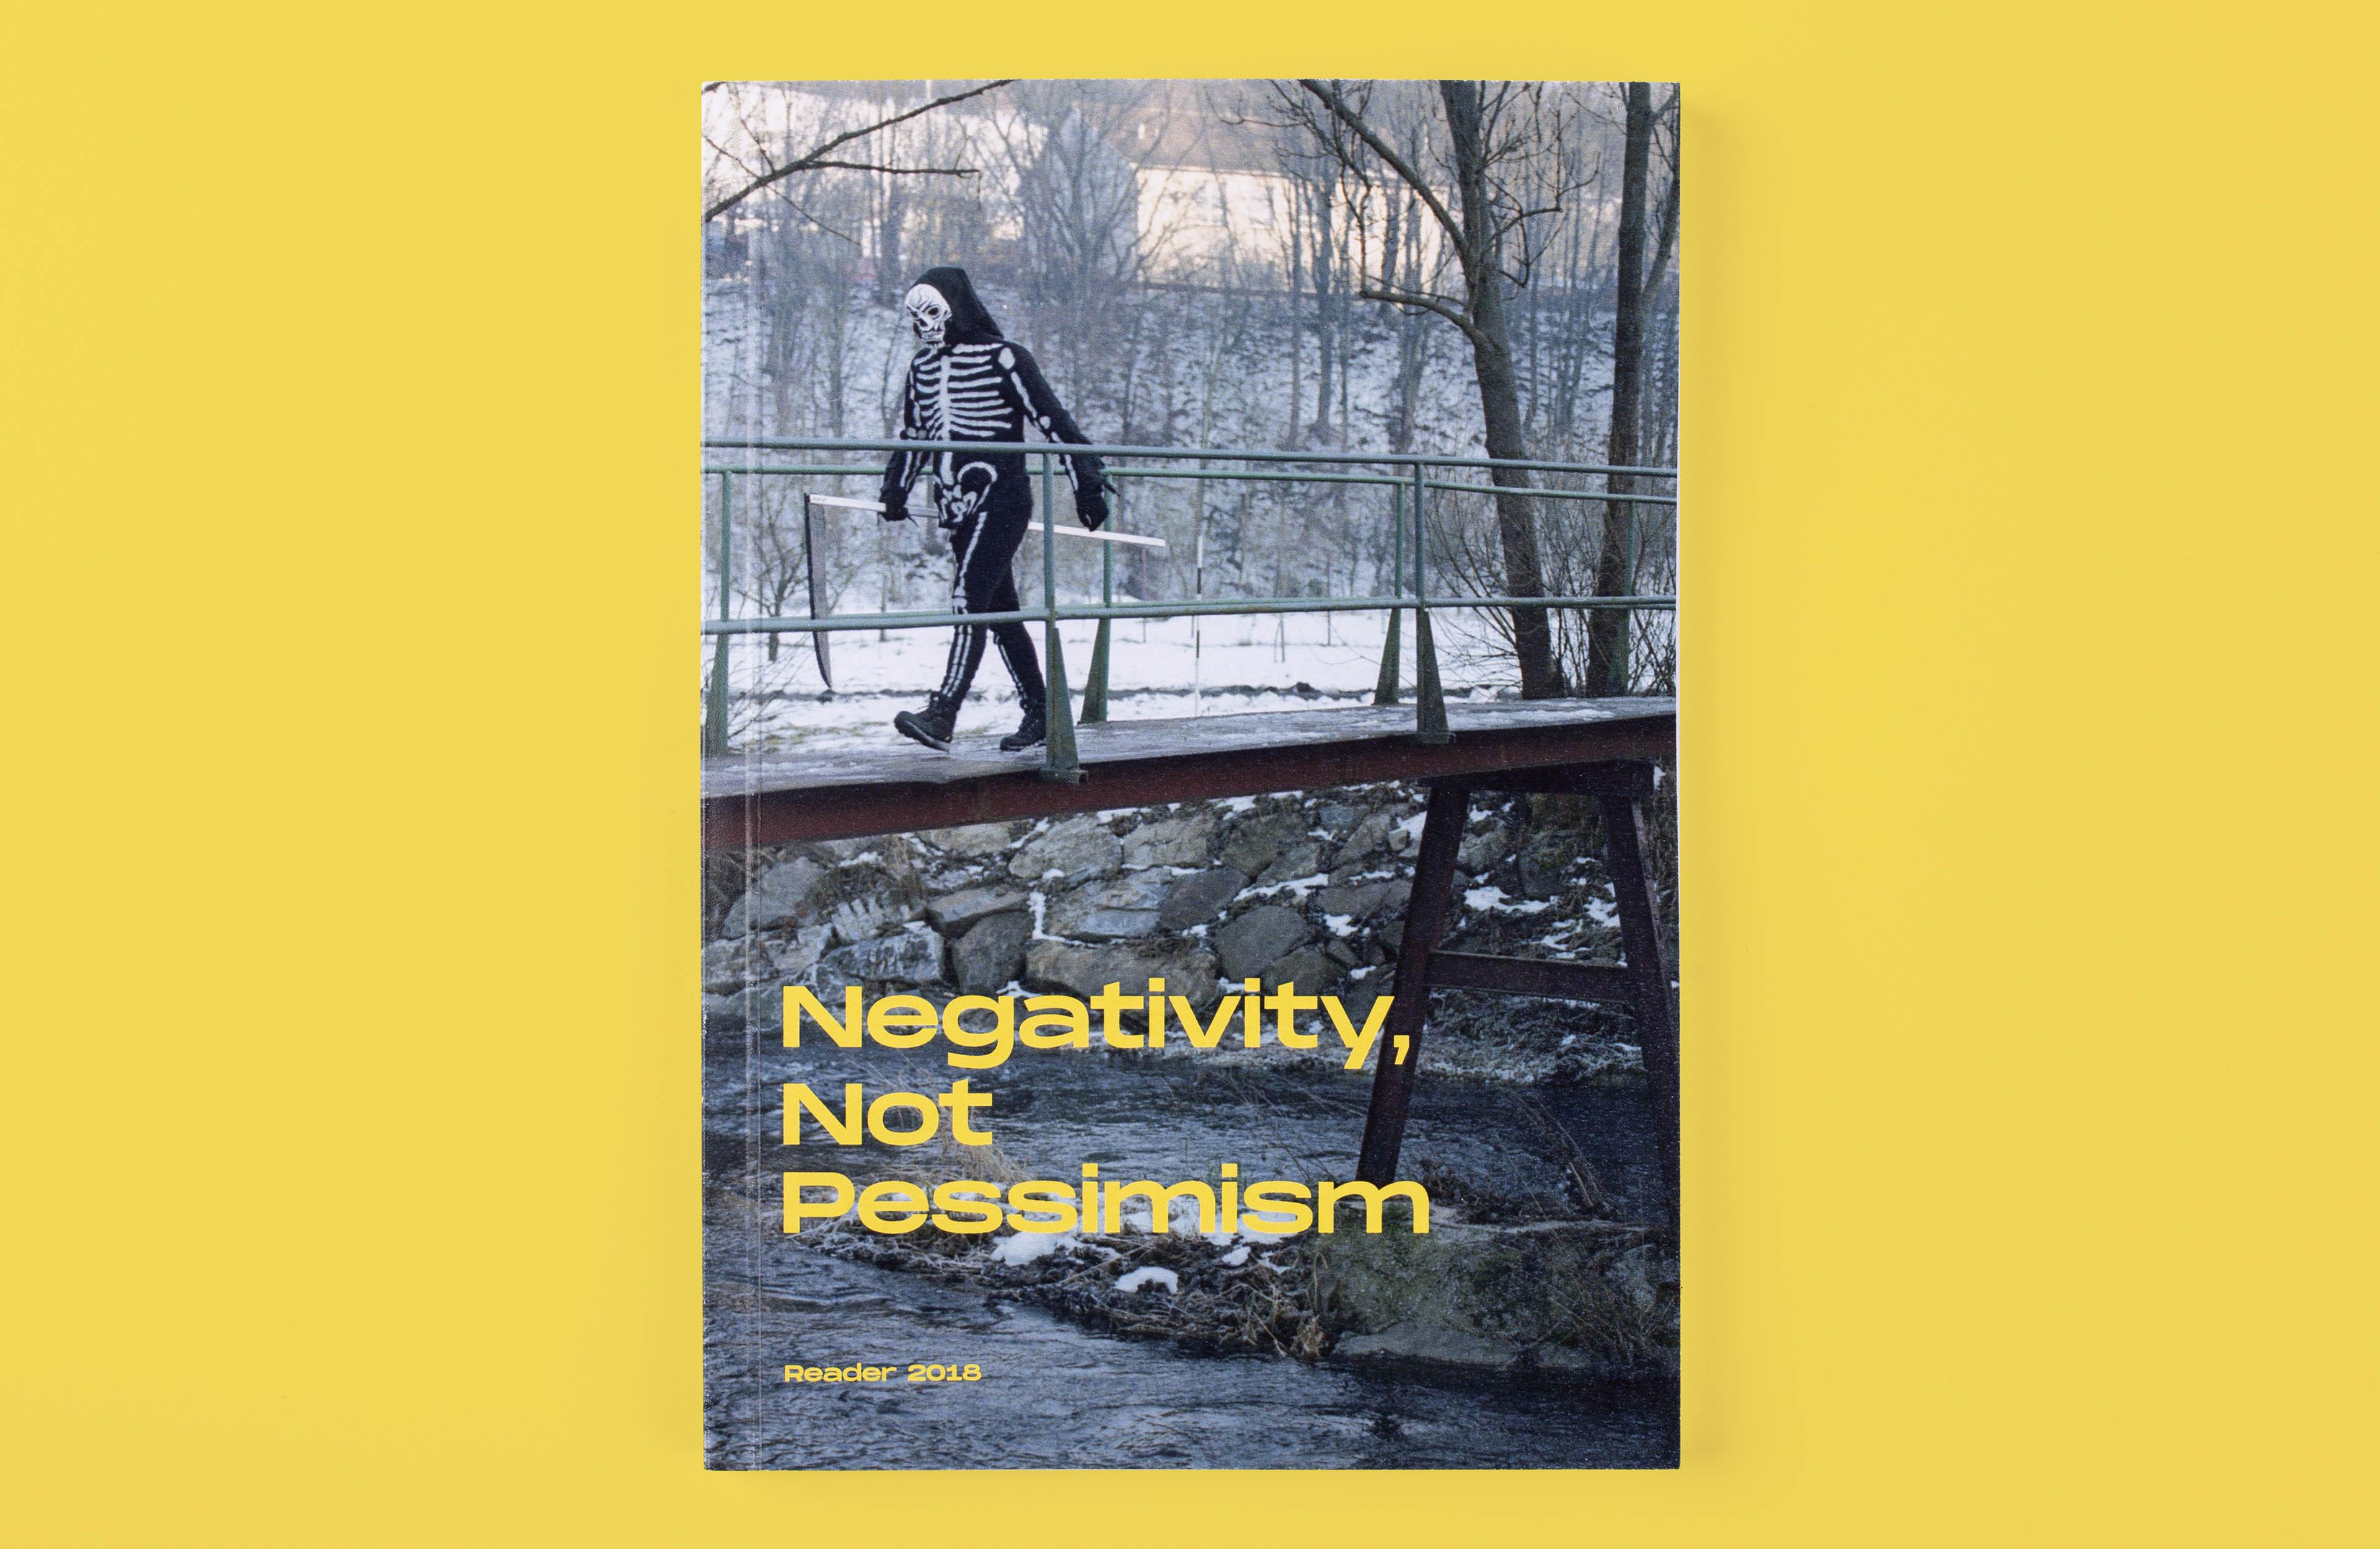 Negativity, Not Pessimism